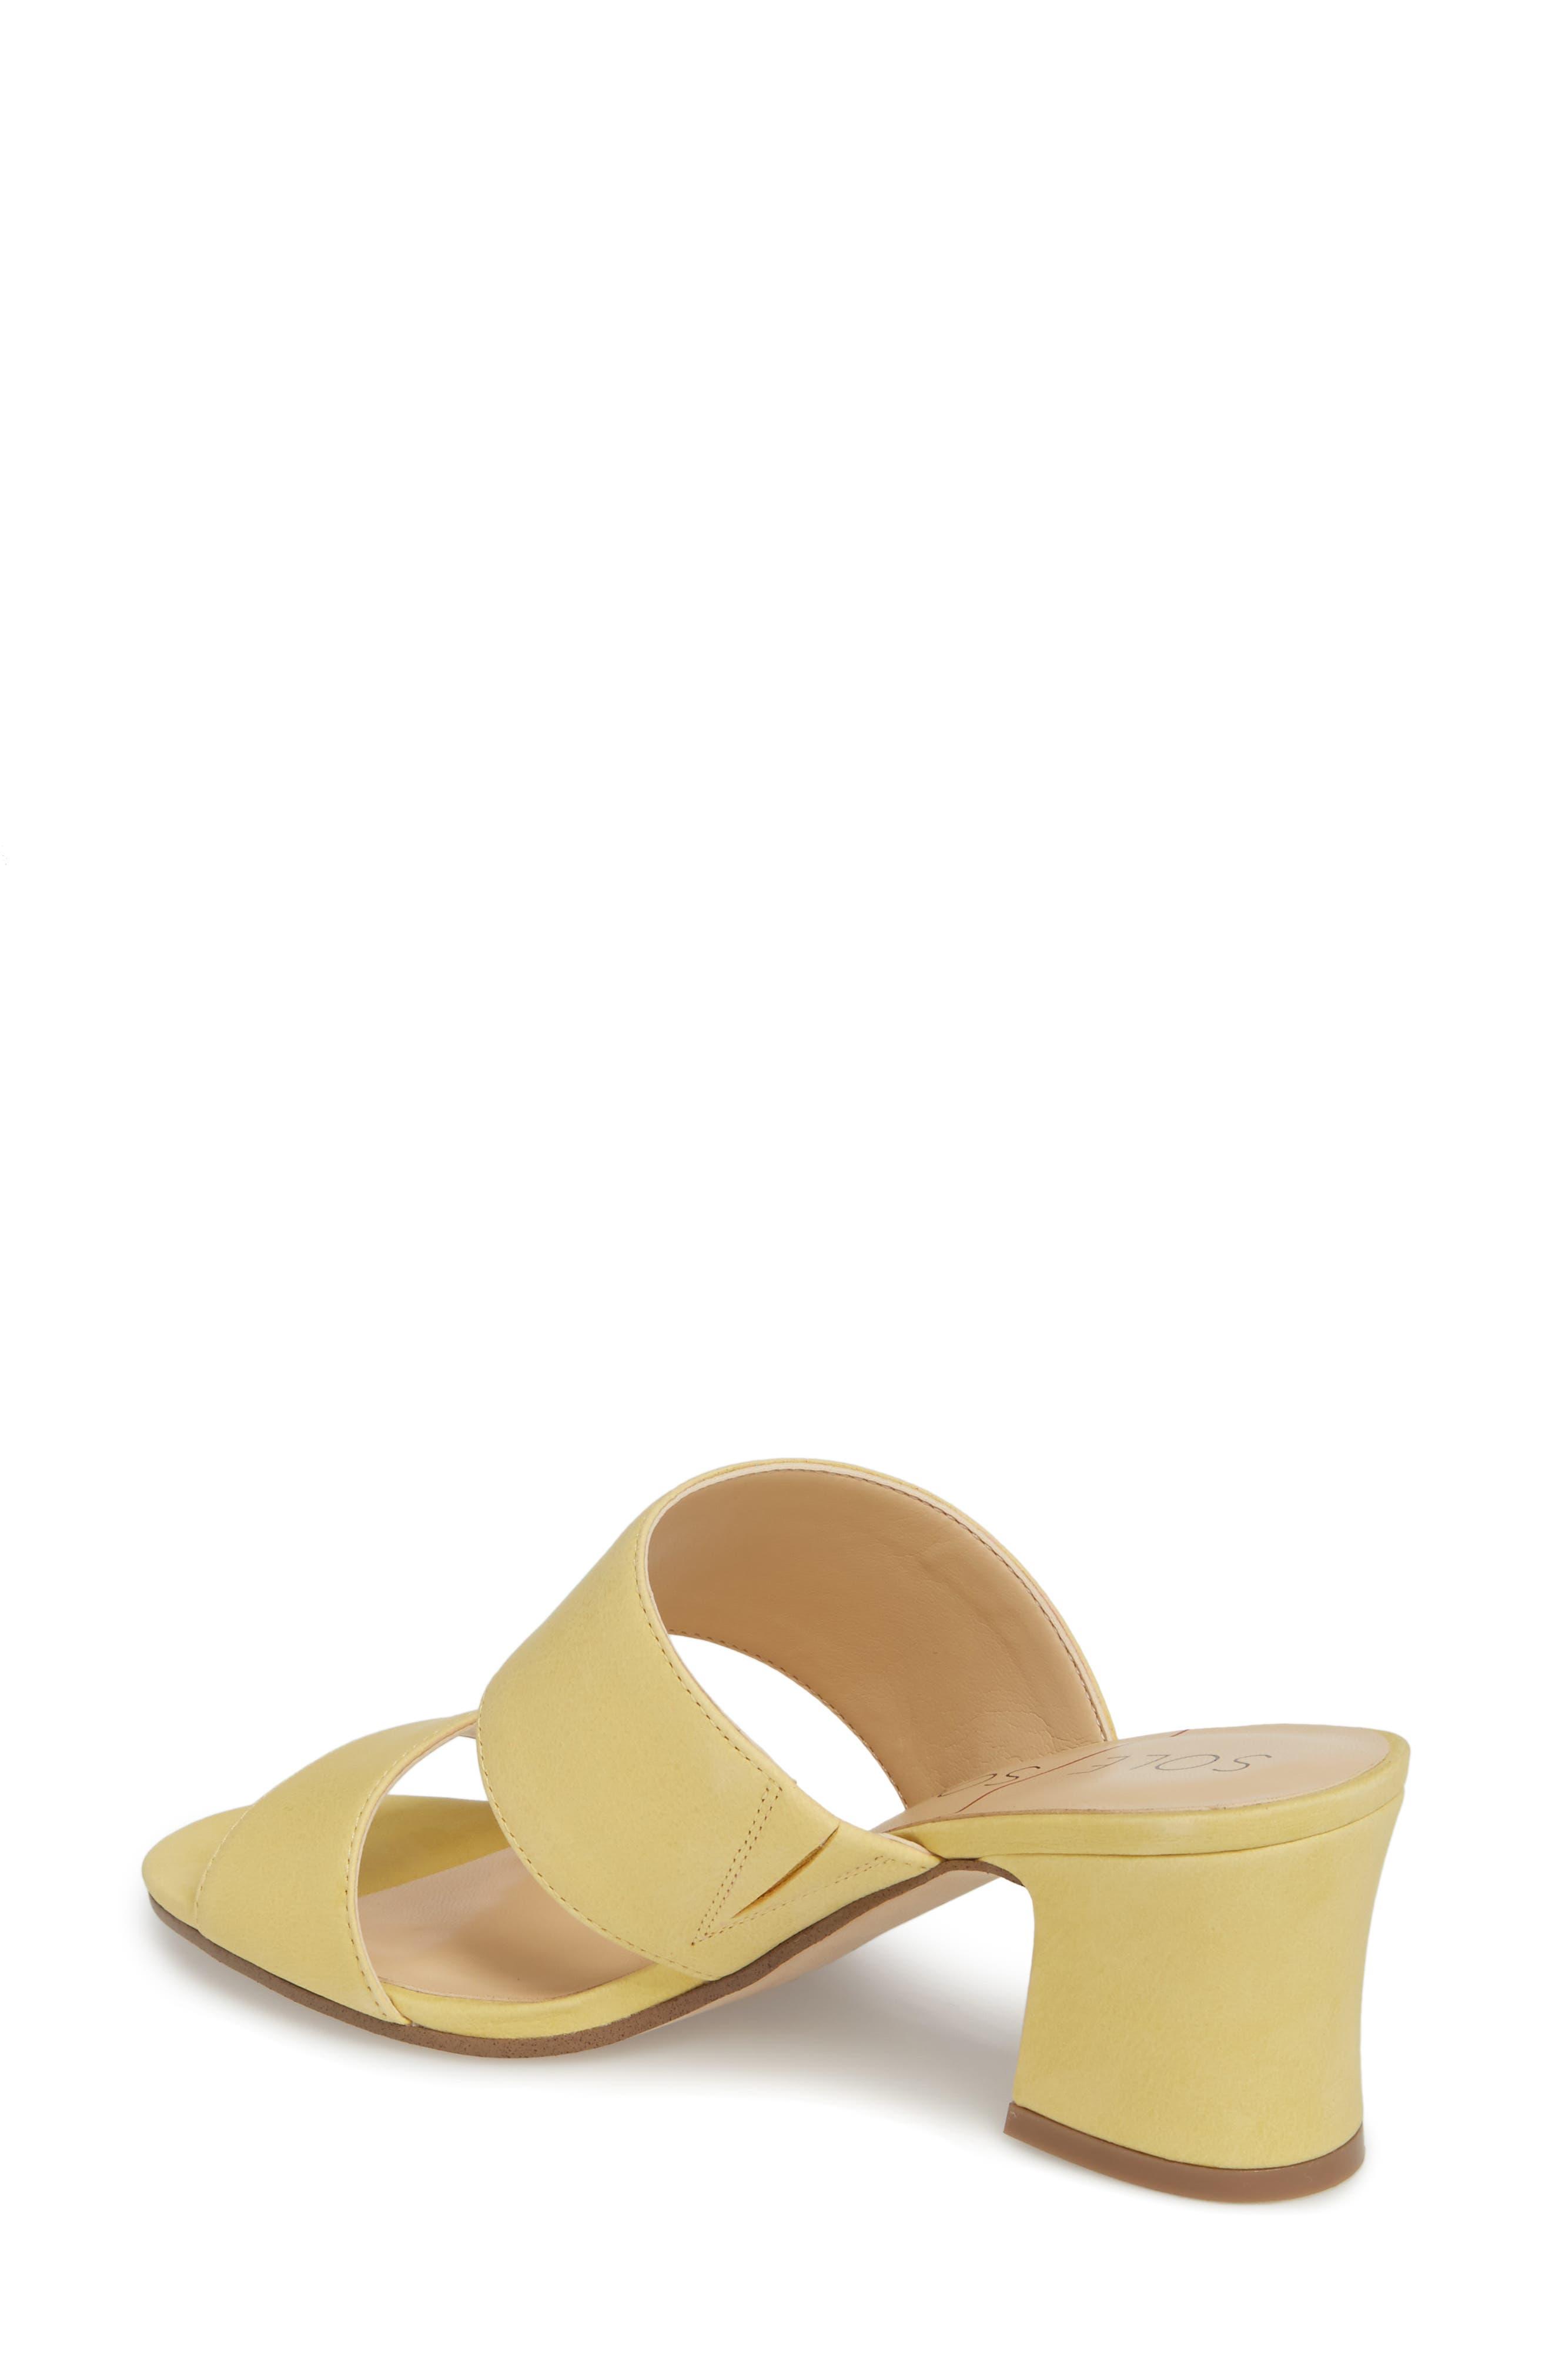 Heline Slide Sandal,                             Alternate thumbnail 2, color,                             Pale Yellow